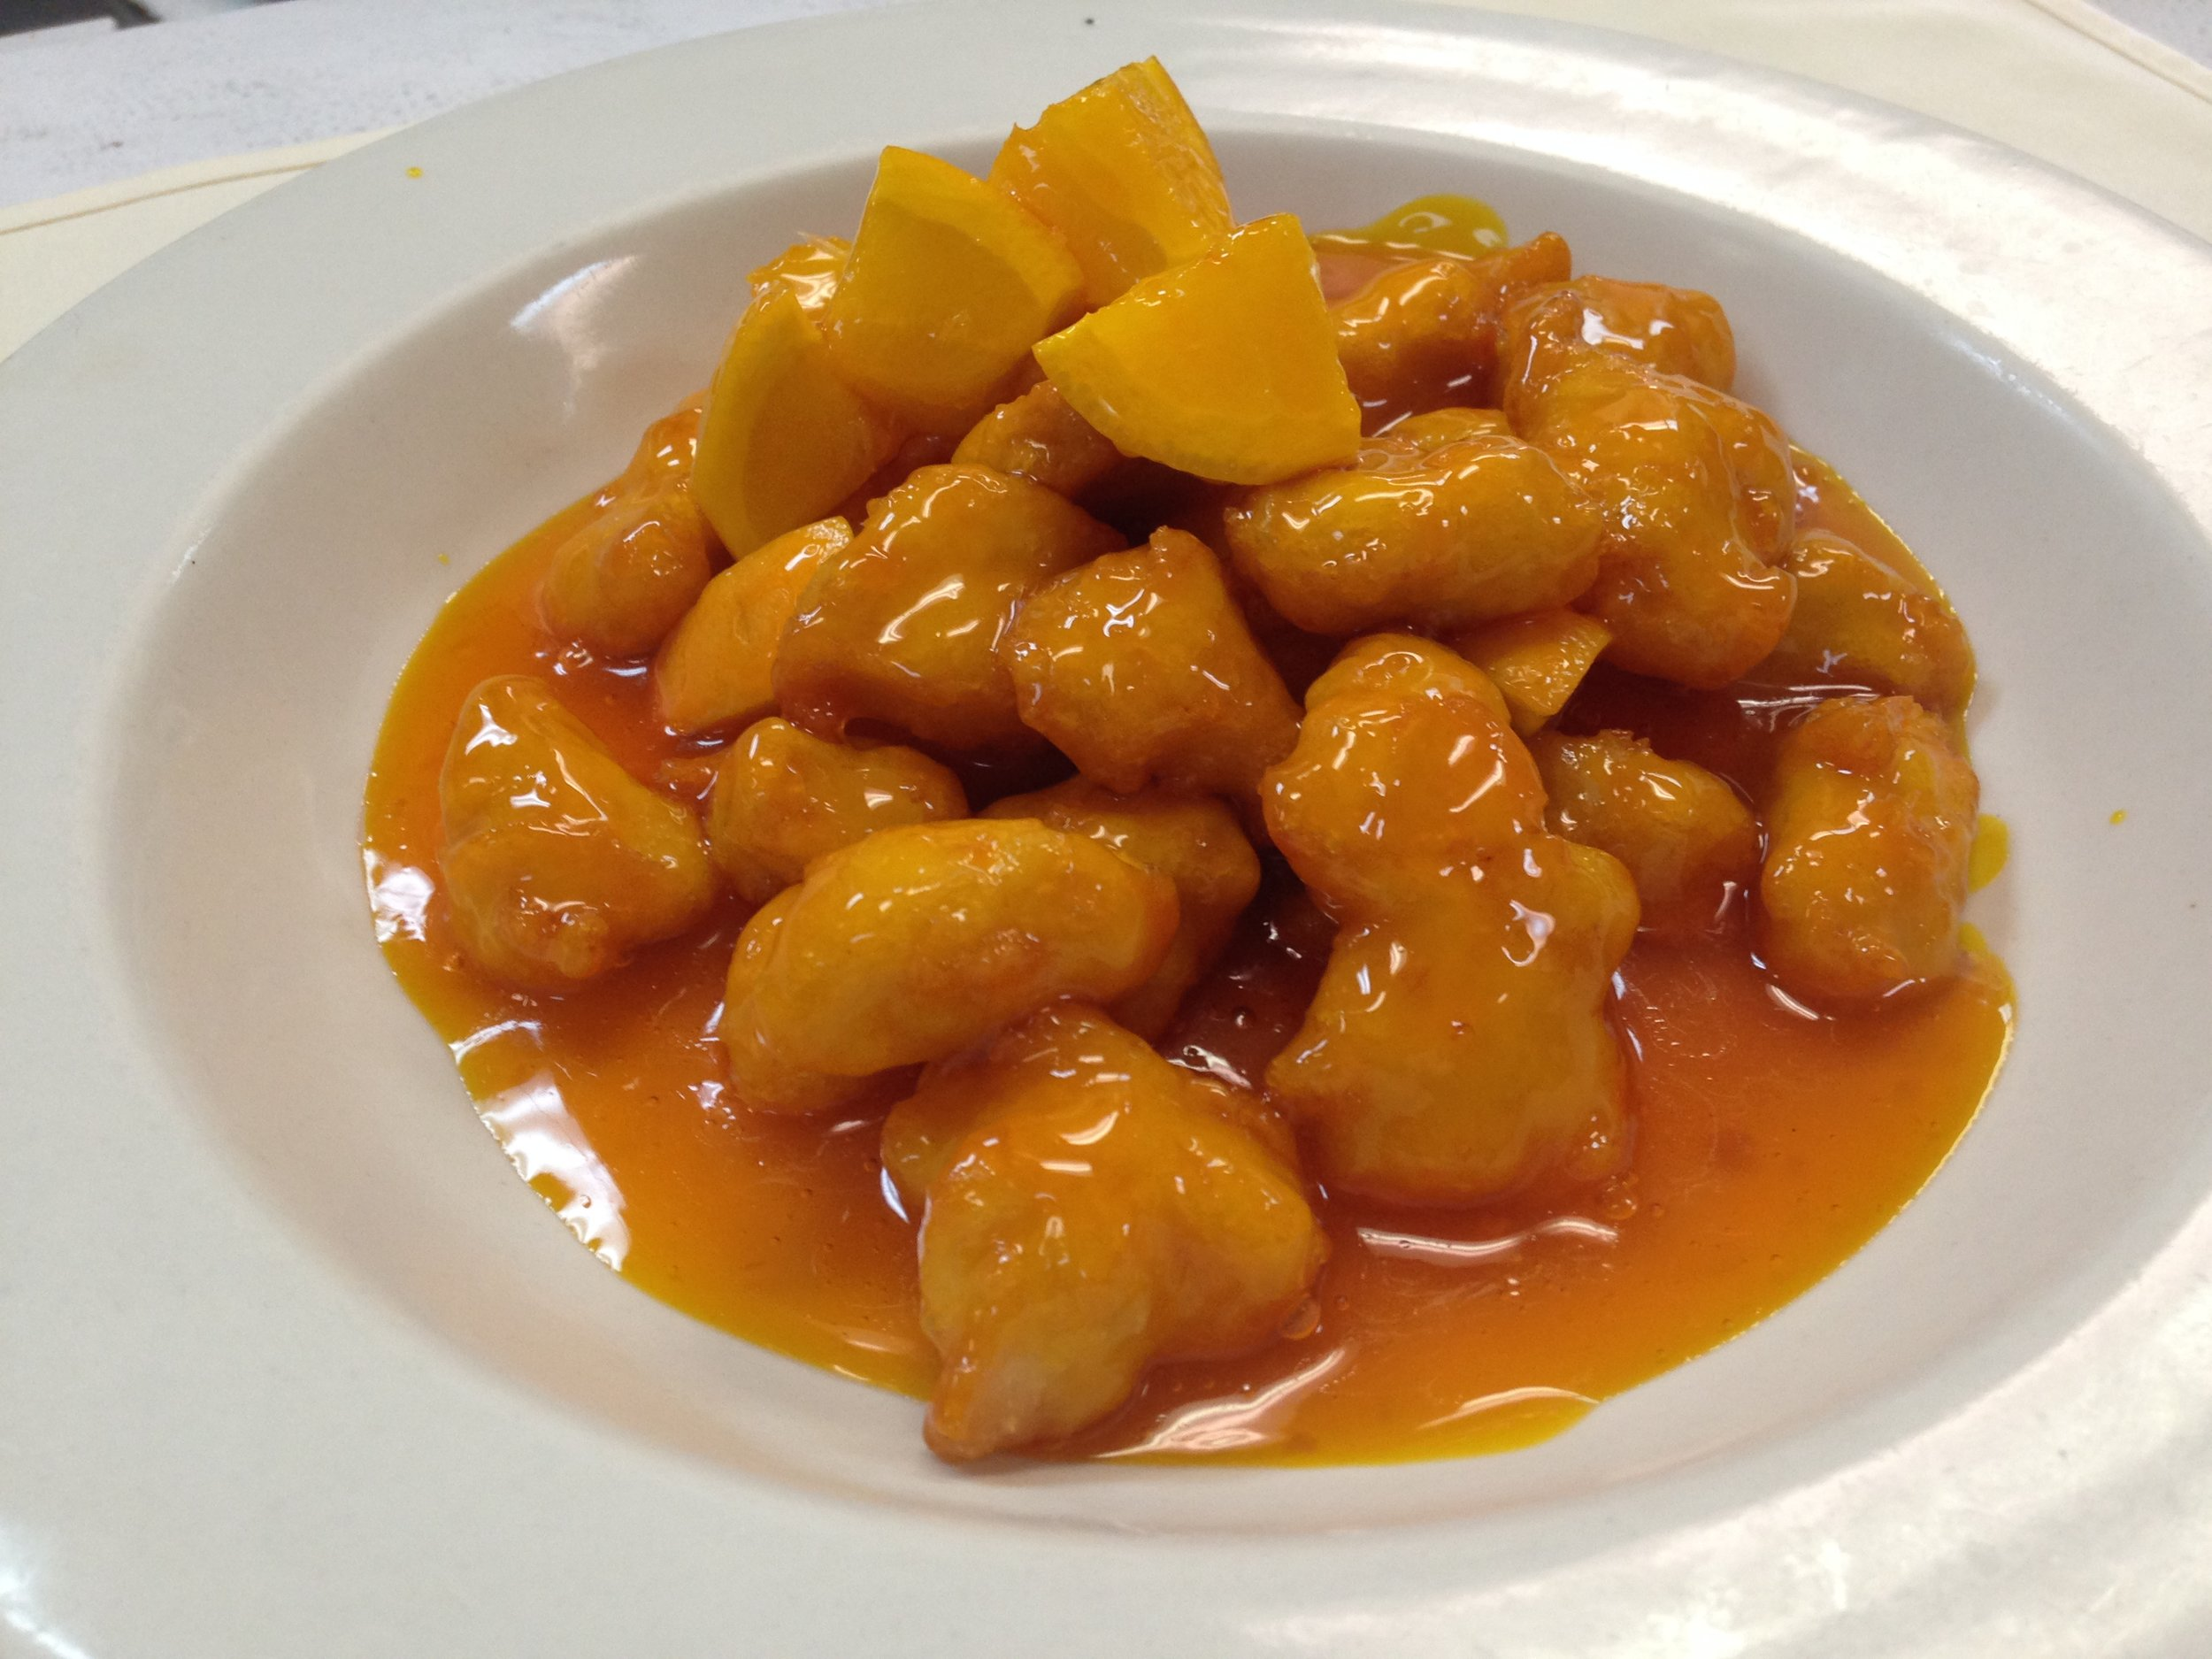 orange chicken - Marinated fried chicken in orange juice, topped with fresh orange, served with rice  7.25 / 10.95